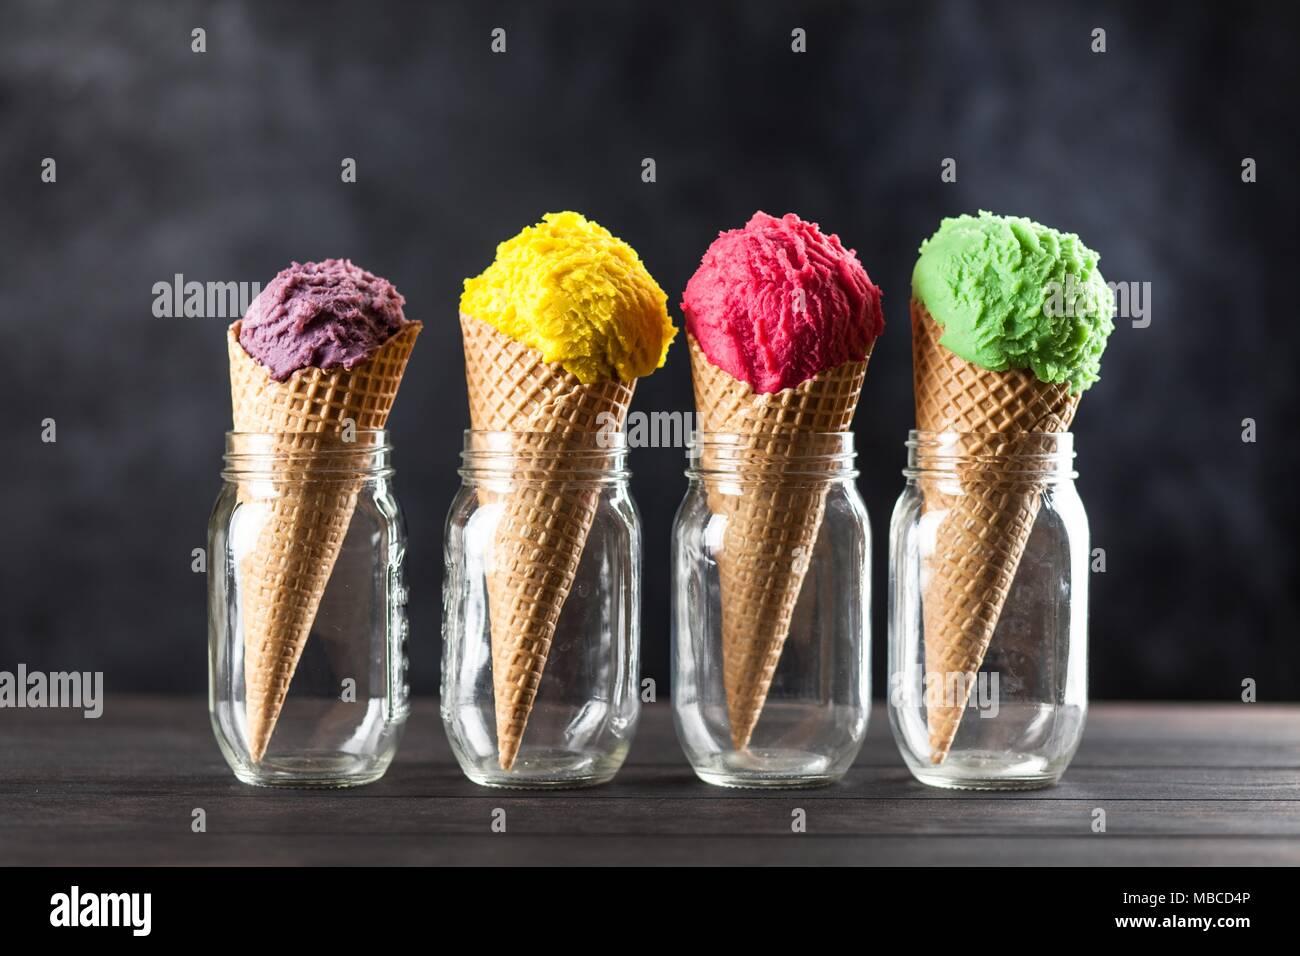 Ice cream cone Photo Stock